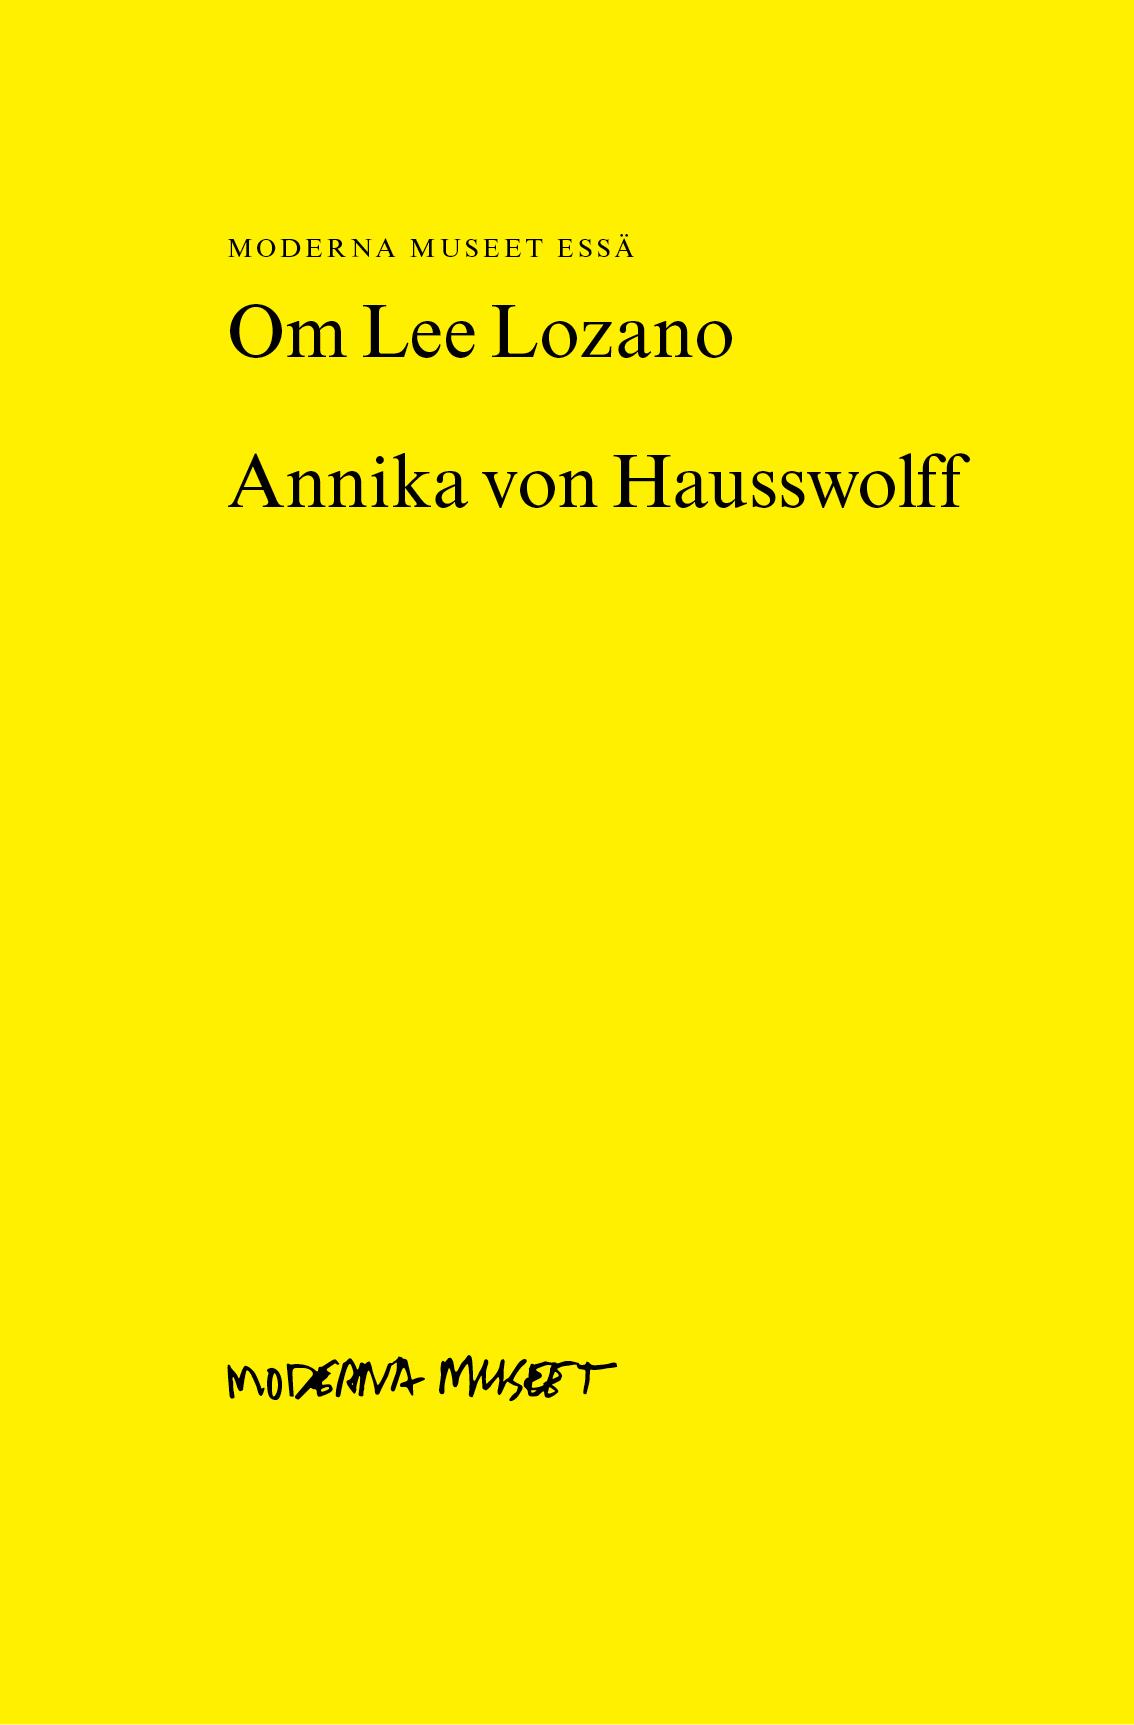 Thumbnail for Om Lee Lozano